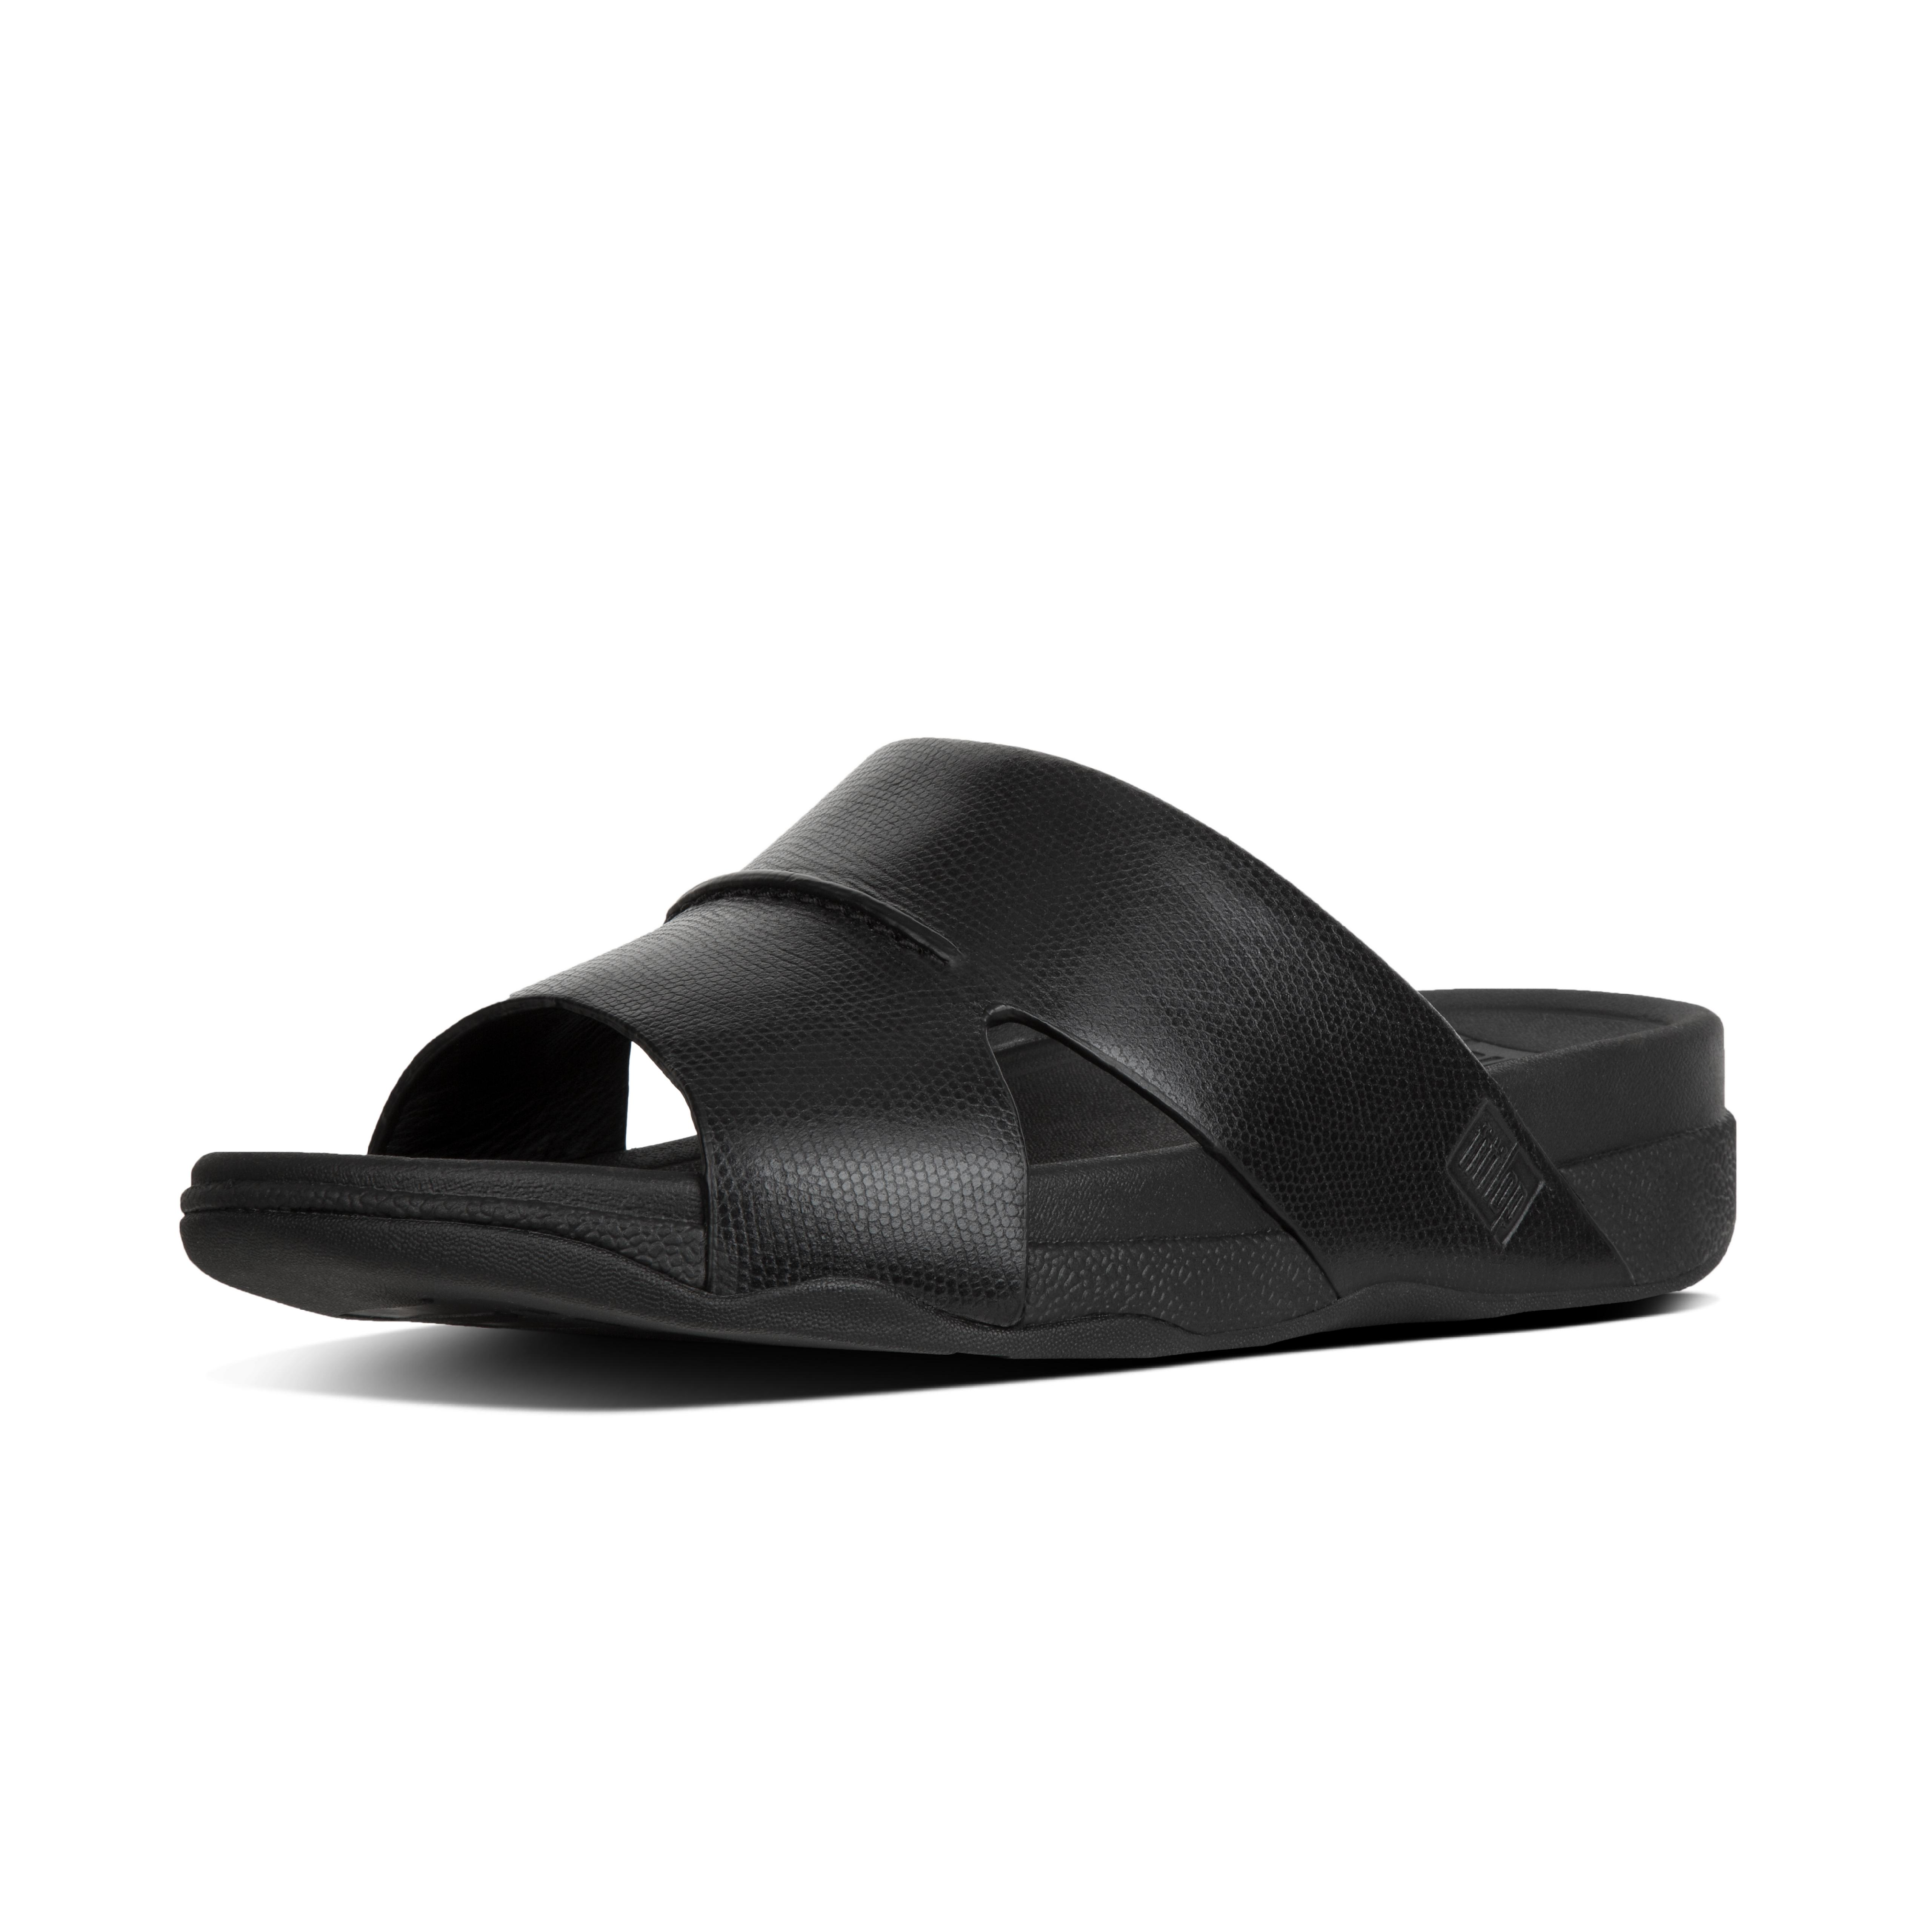 Bando slide in lizard printed leather black k85 001